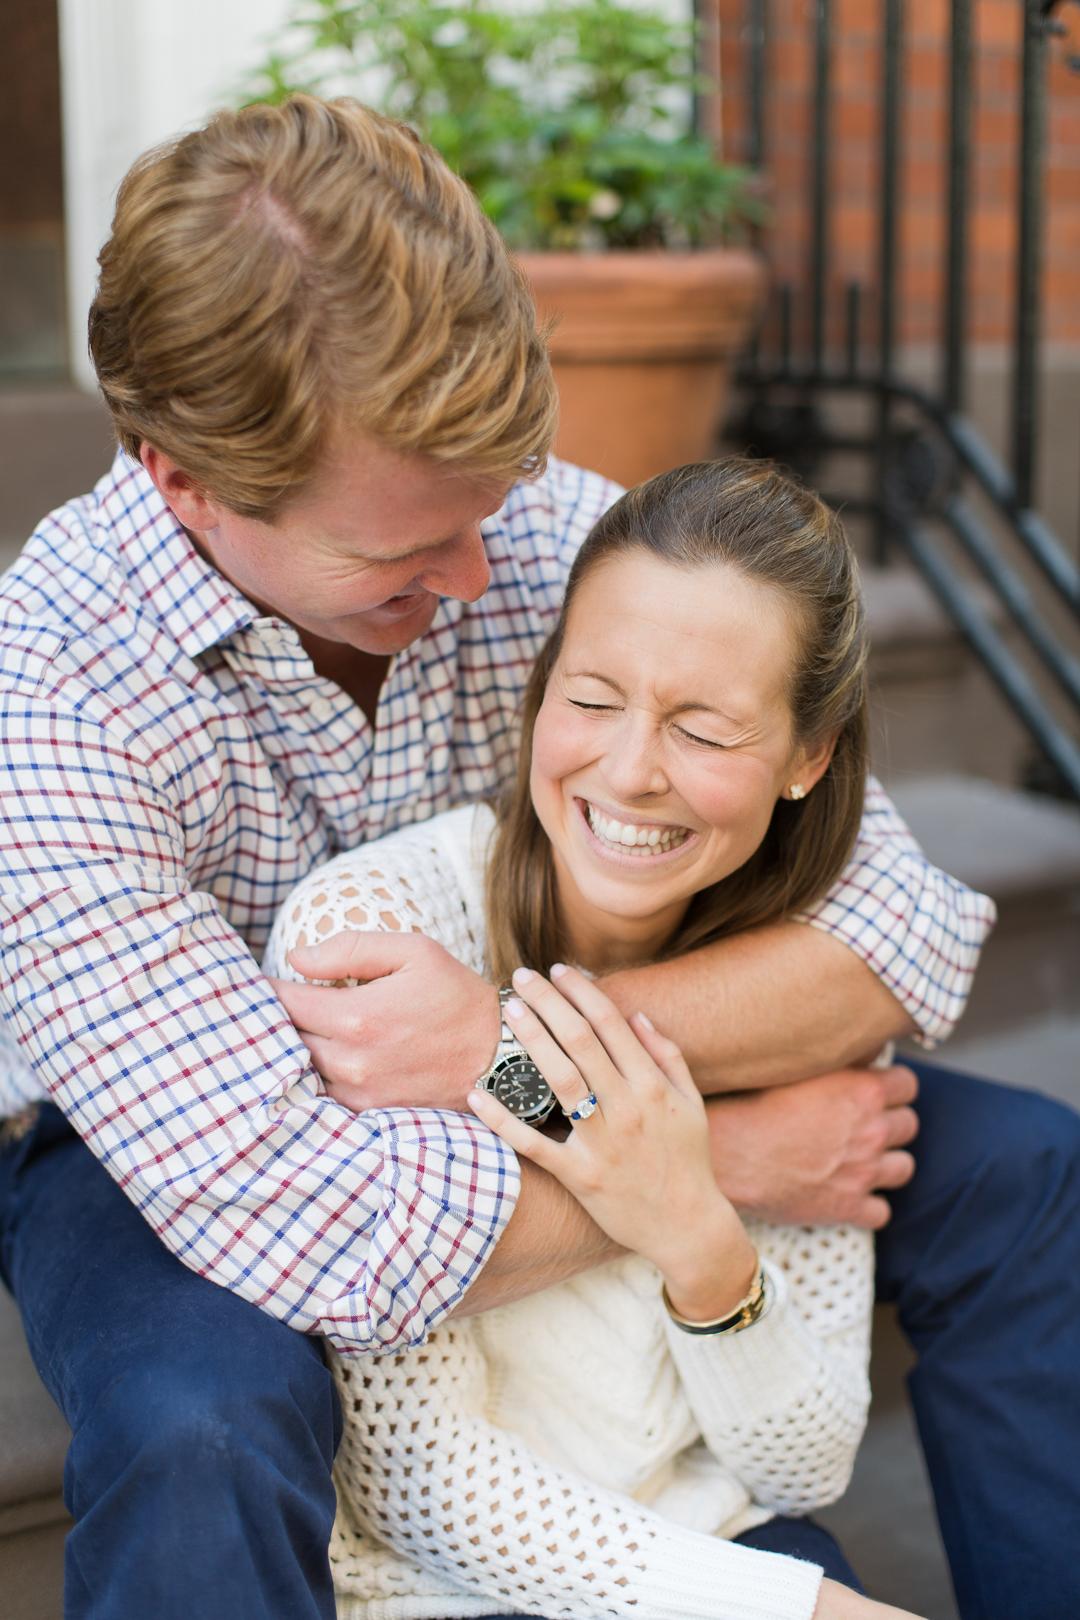 Melissa Kruse Photography - Megan & Tyler West Village Engagement Photos-62.jpg